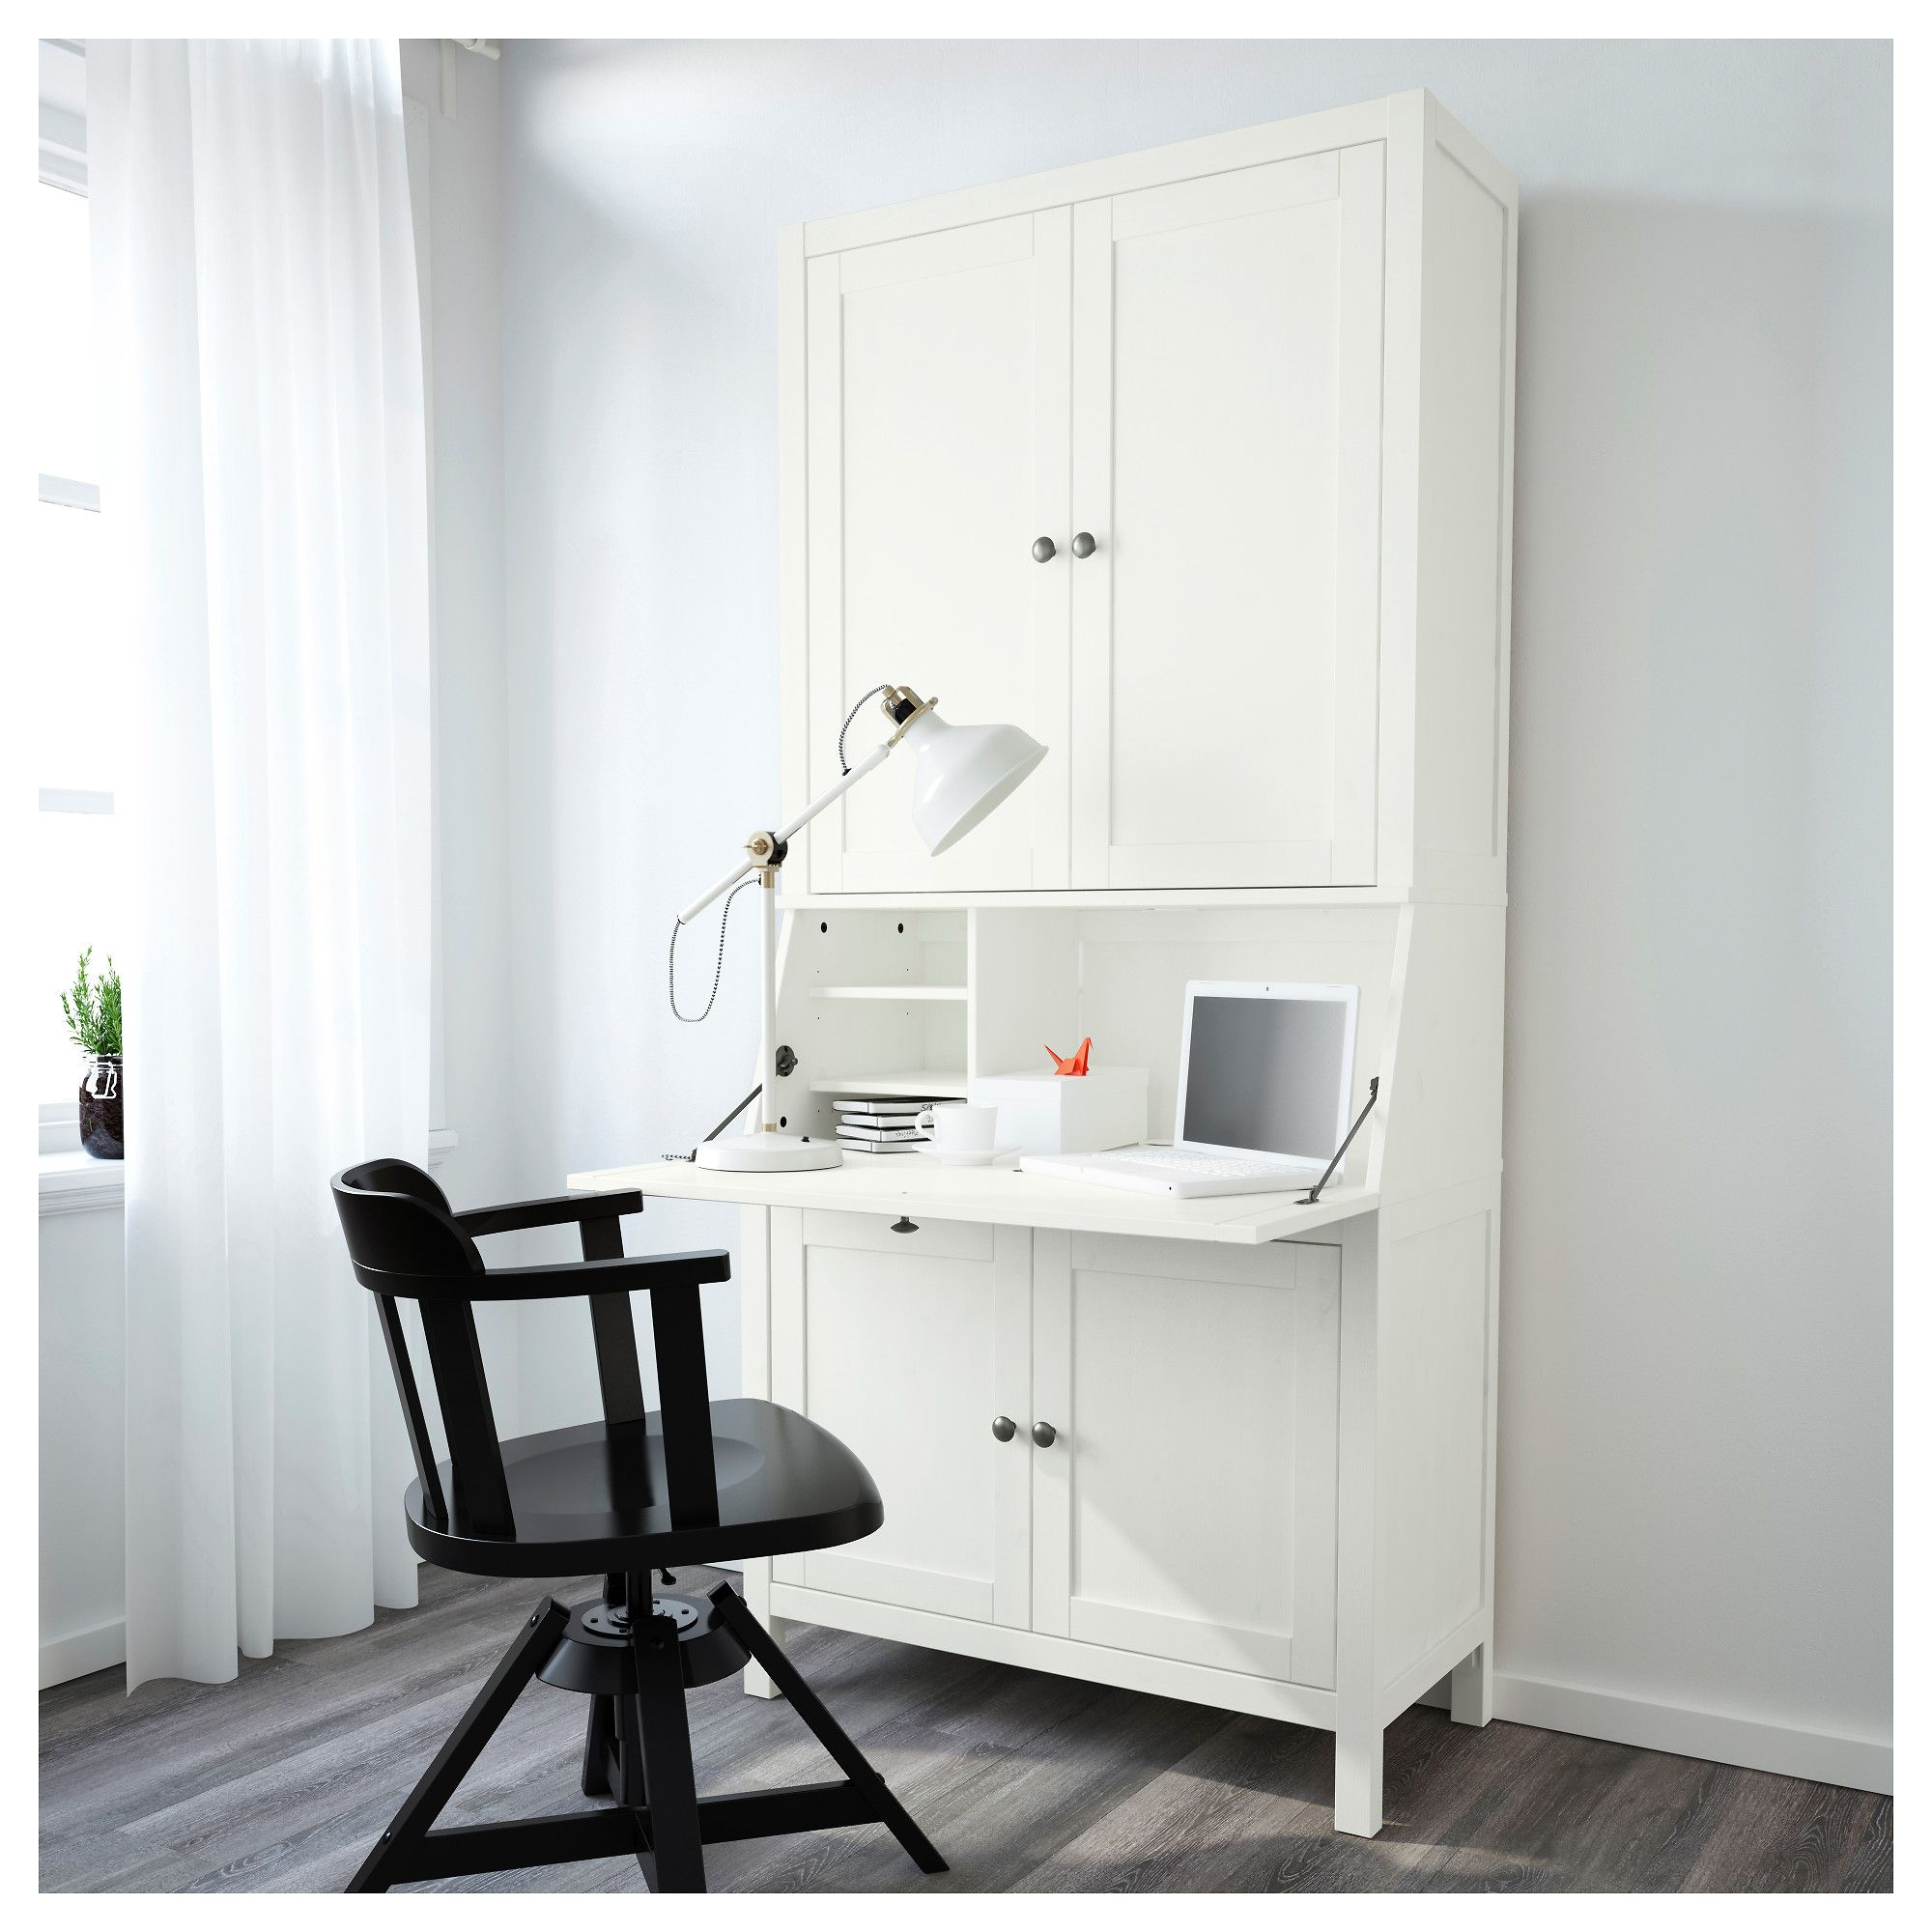 kafe grafeio skoyro ikea hemnes desks me drawers with furniture en office tables desk syrtaria